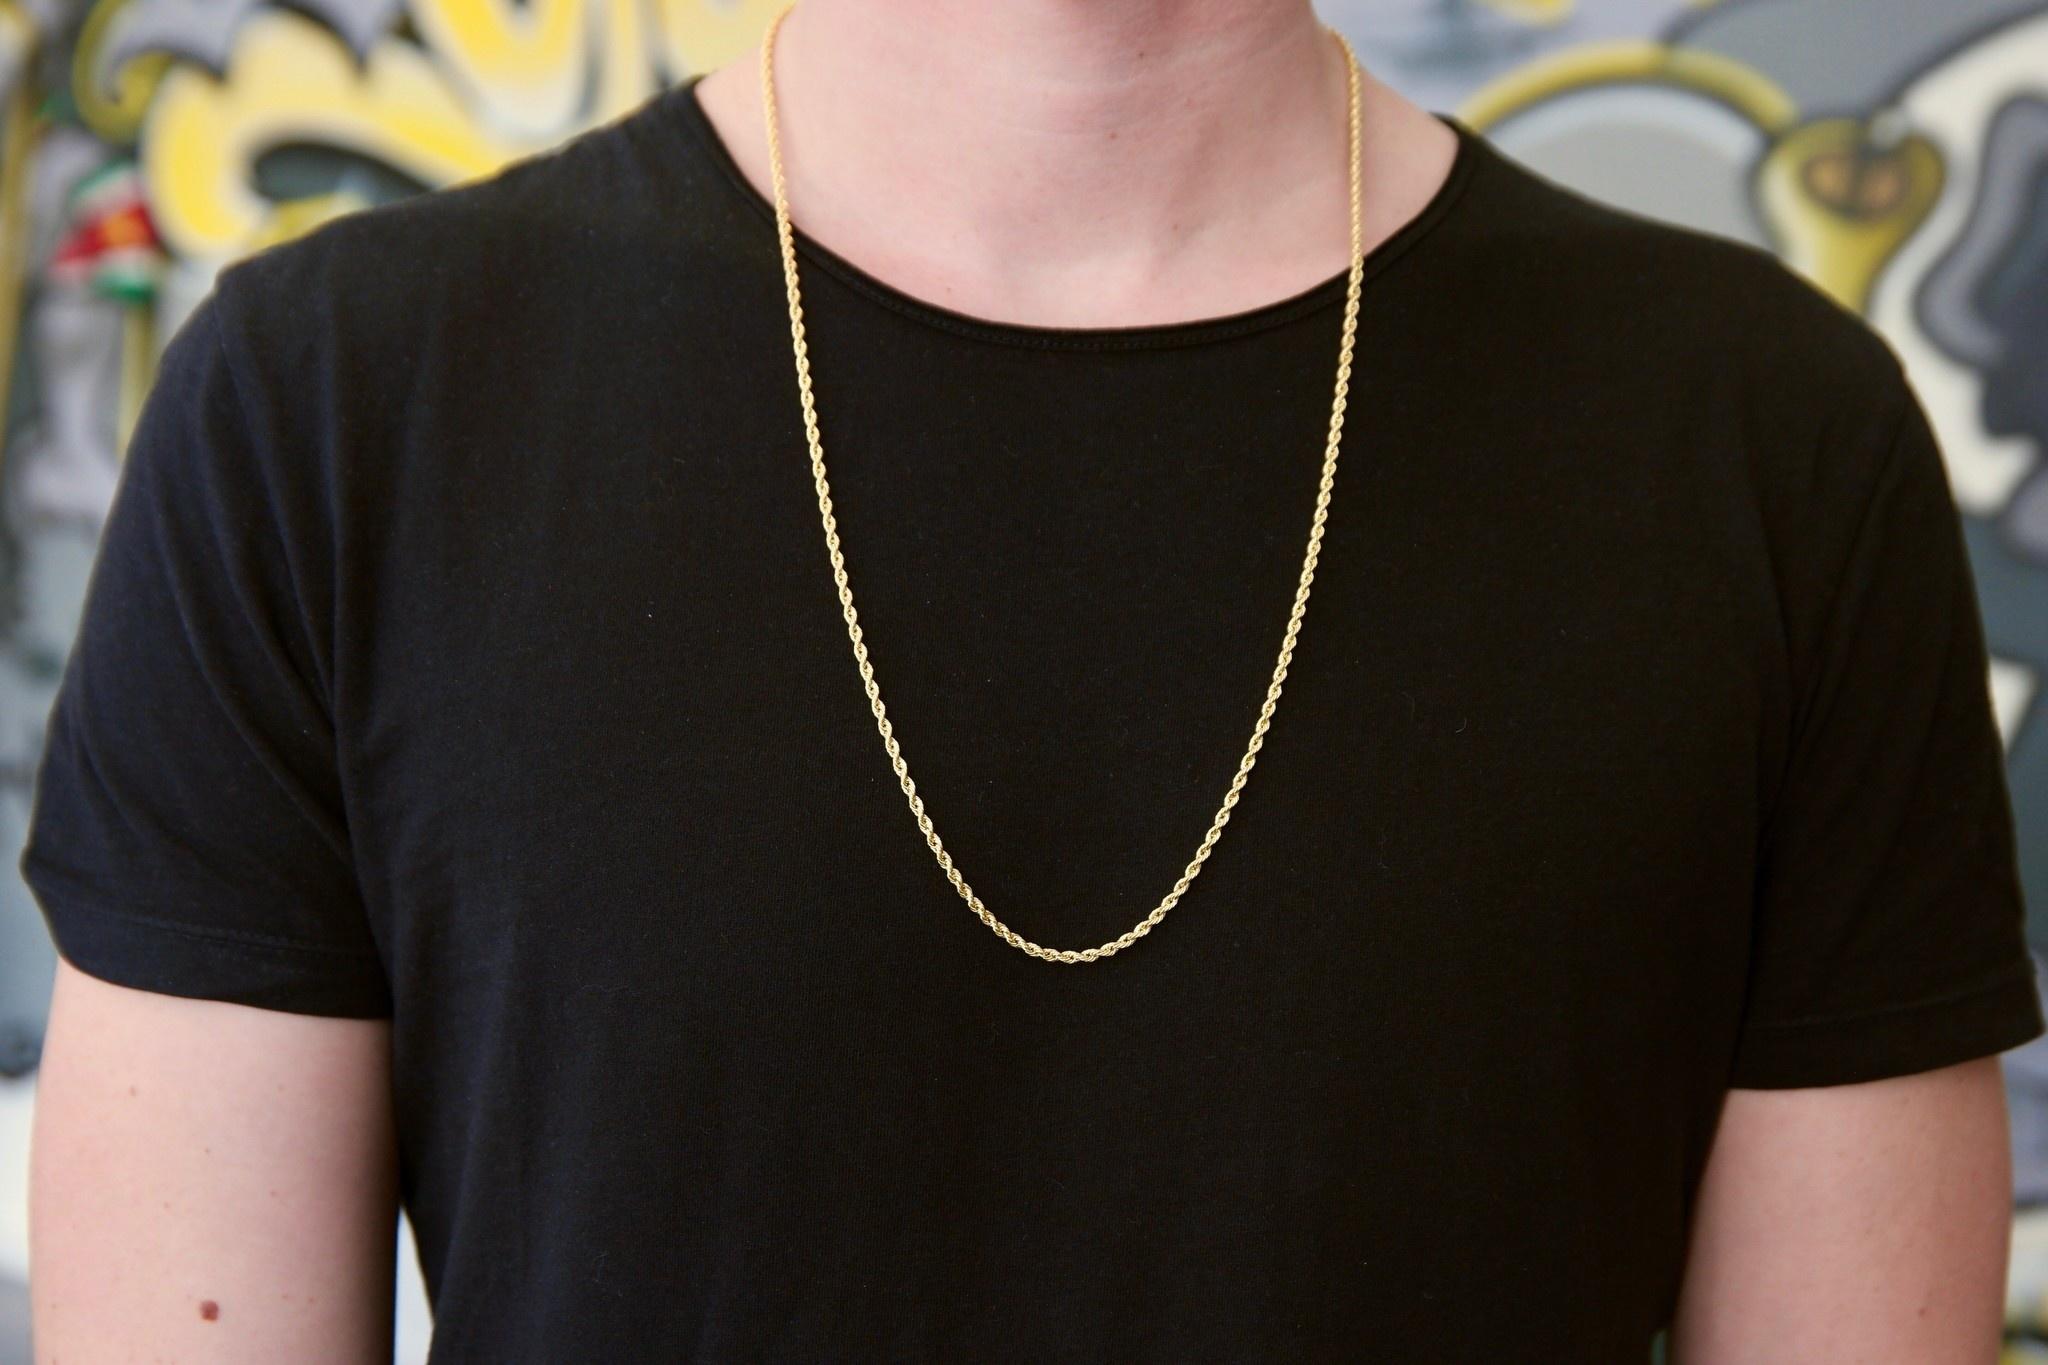 Rope chain ketting massief goud 14 kt 2.5 mm-4